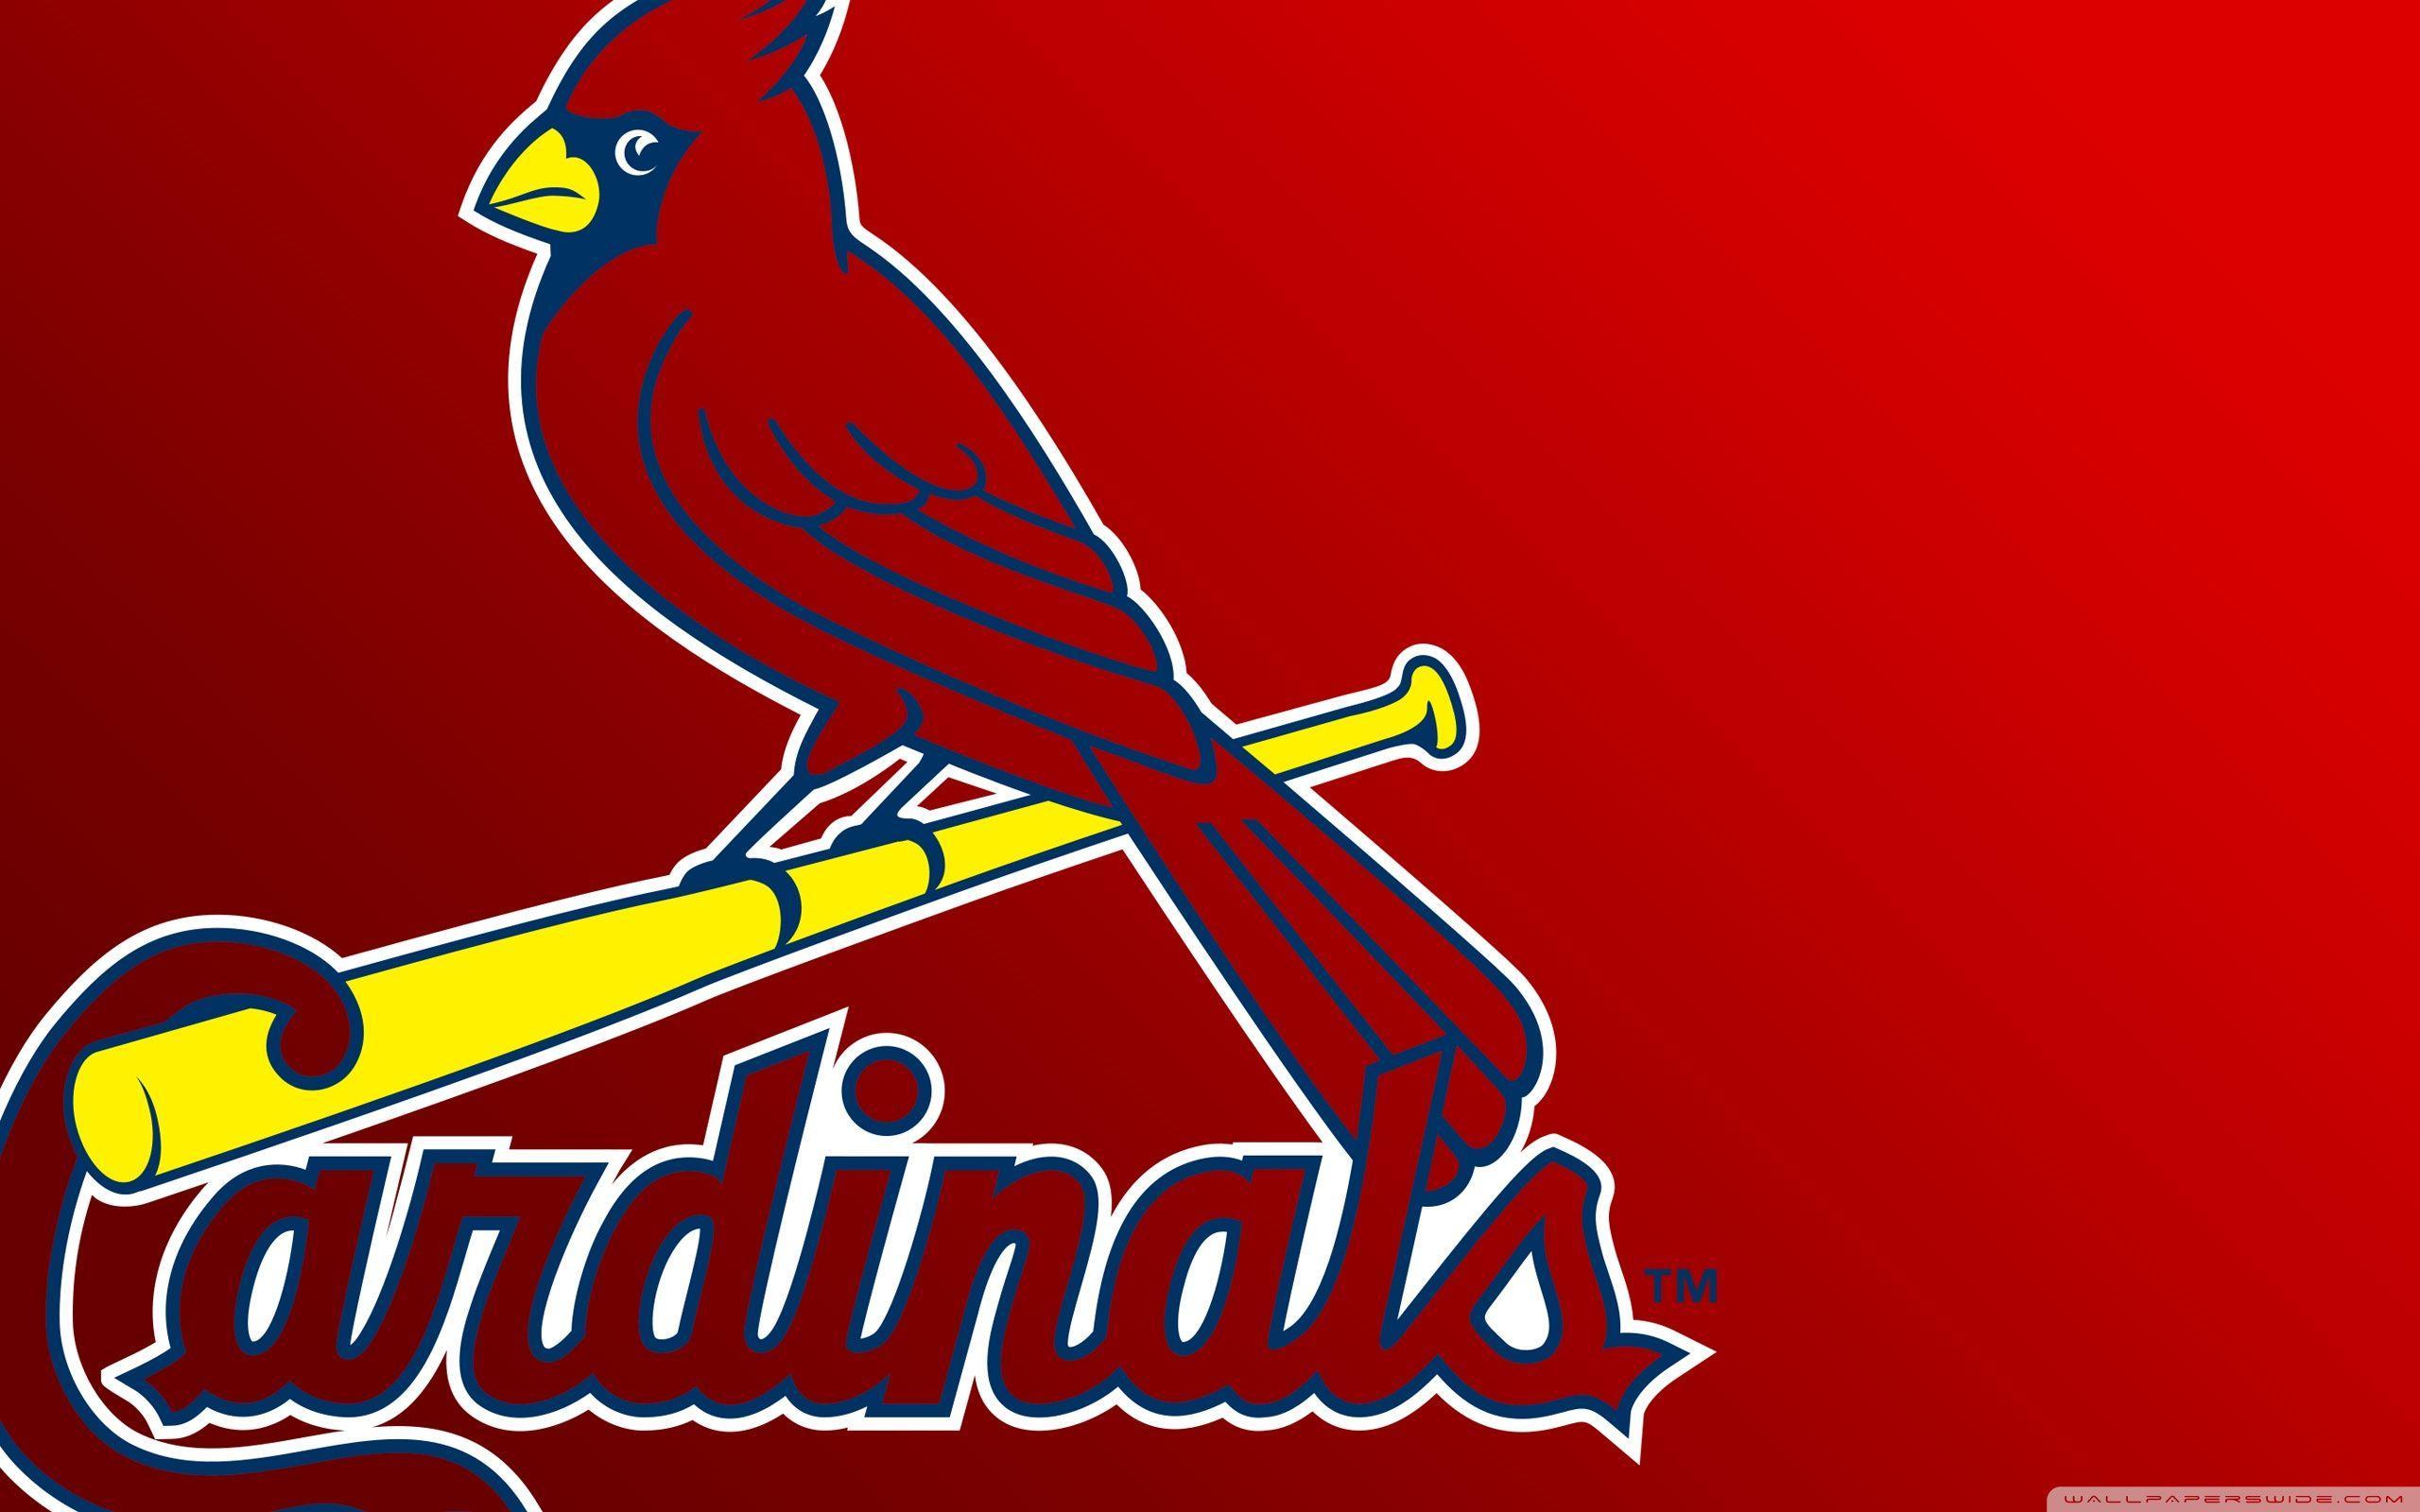 St. Louis Cardinals Wallpapers - Wallpaper Cave